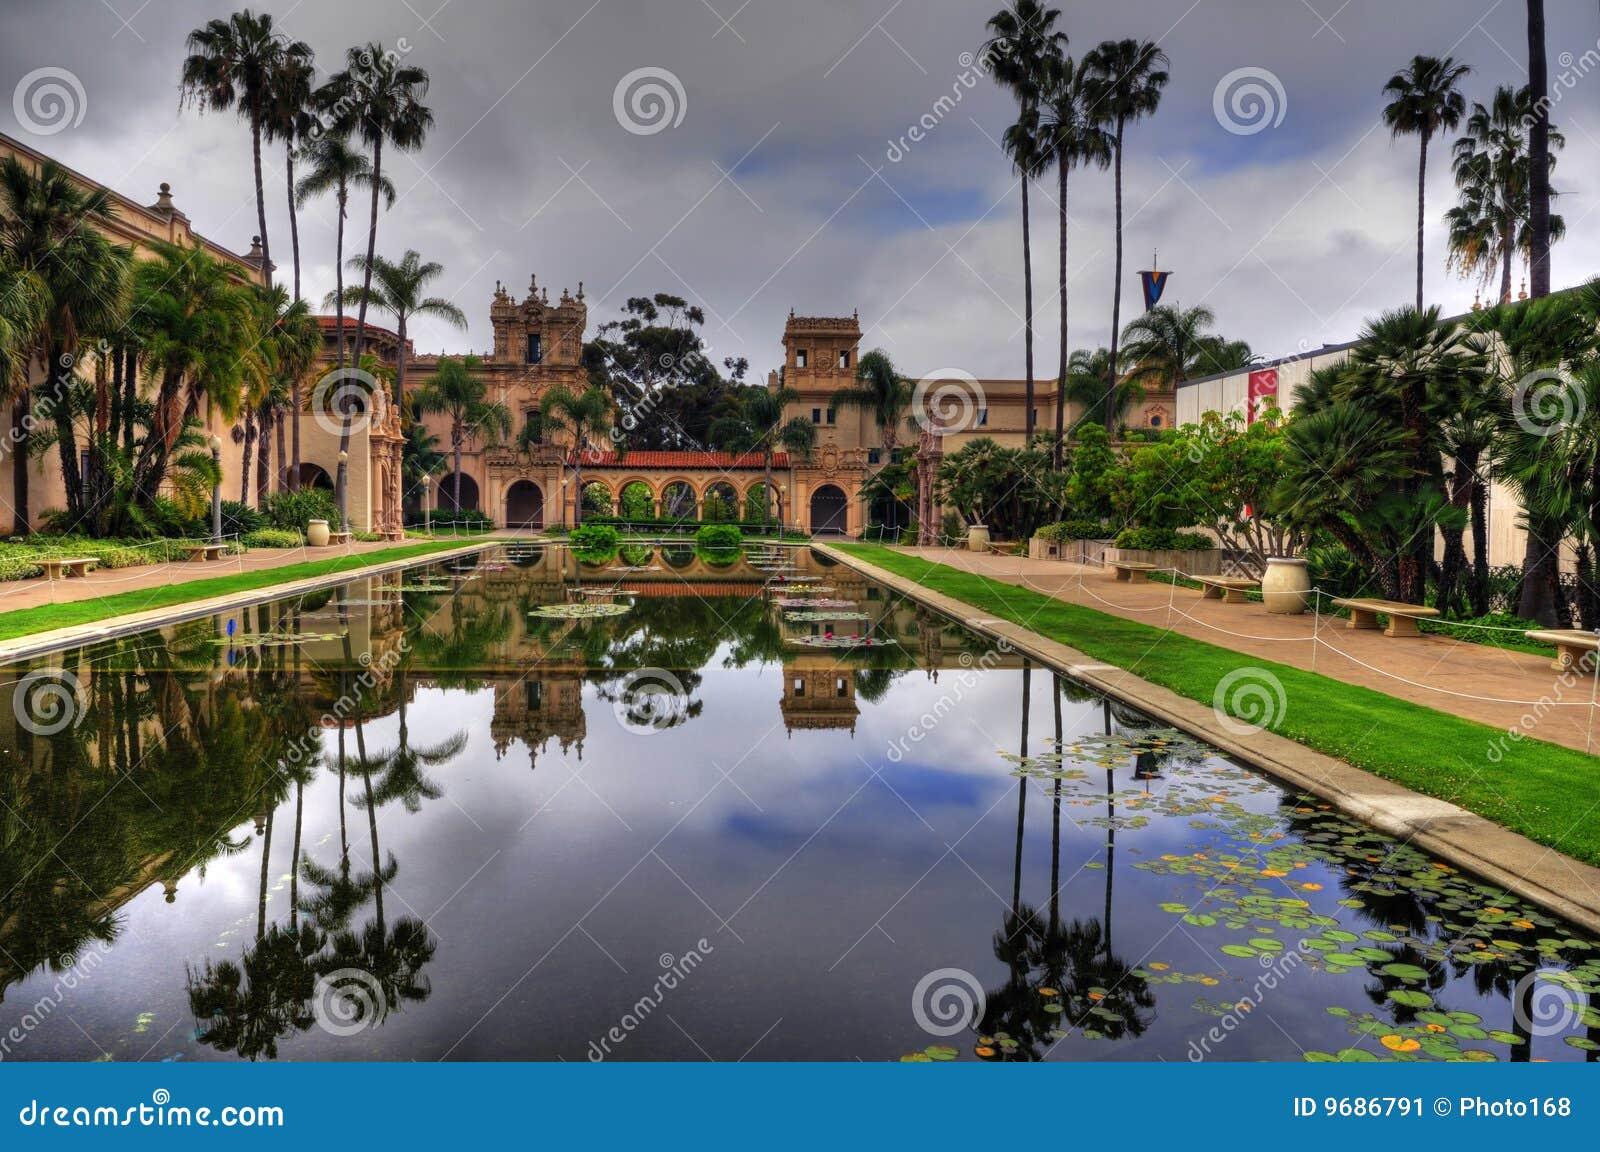 Diego-Balboa-Park